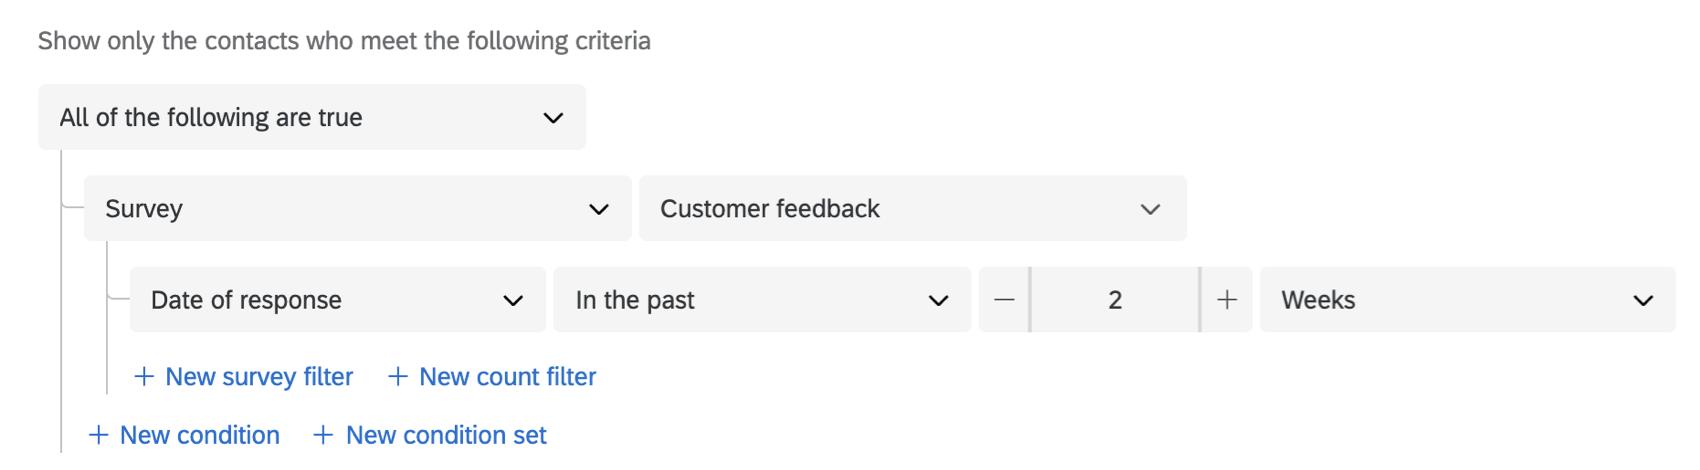 setting segment criteria based on a survey response date